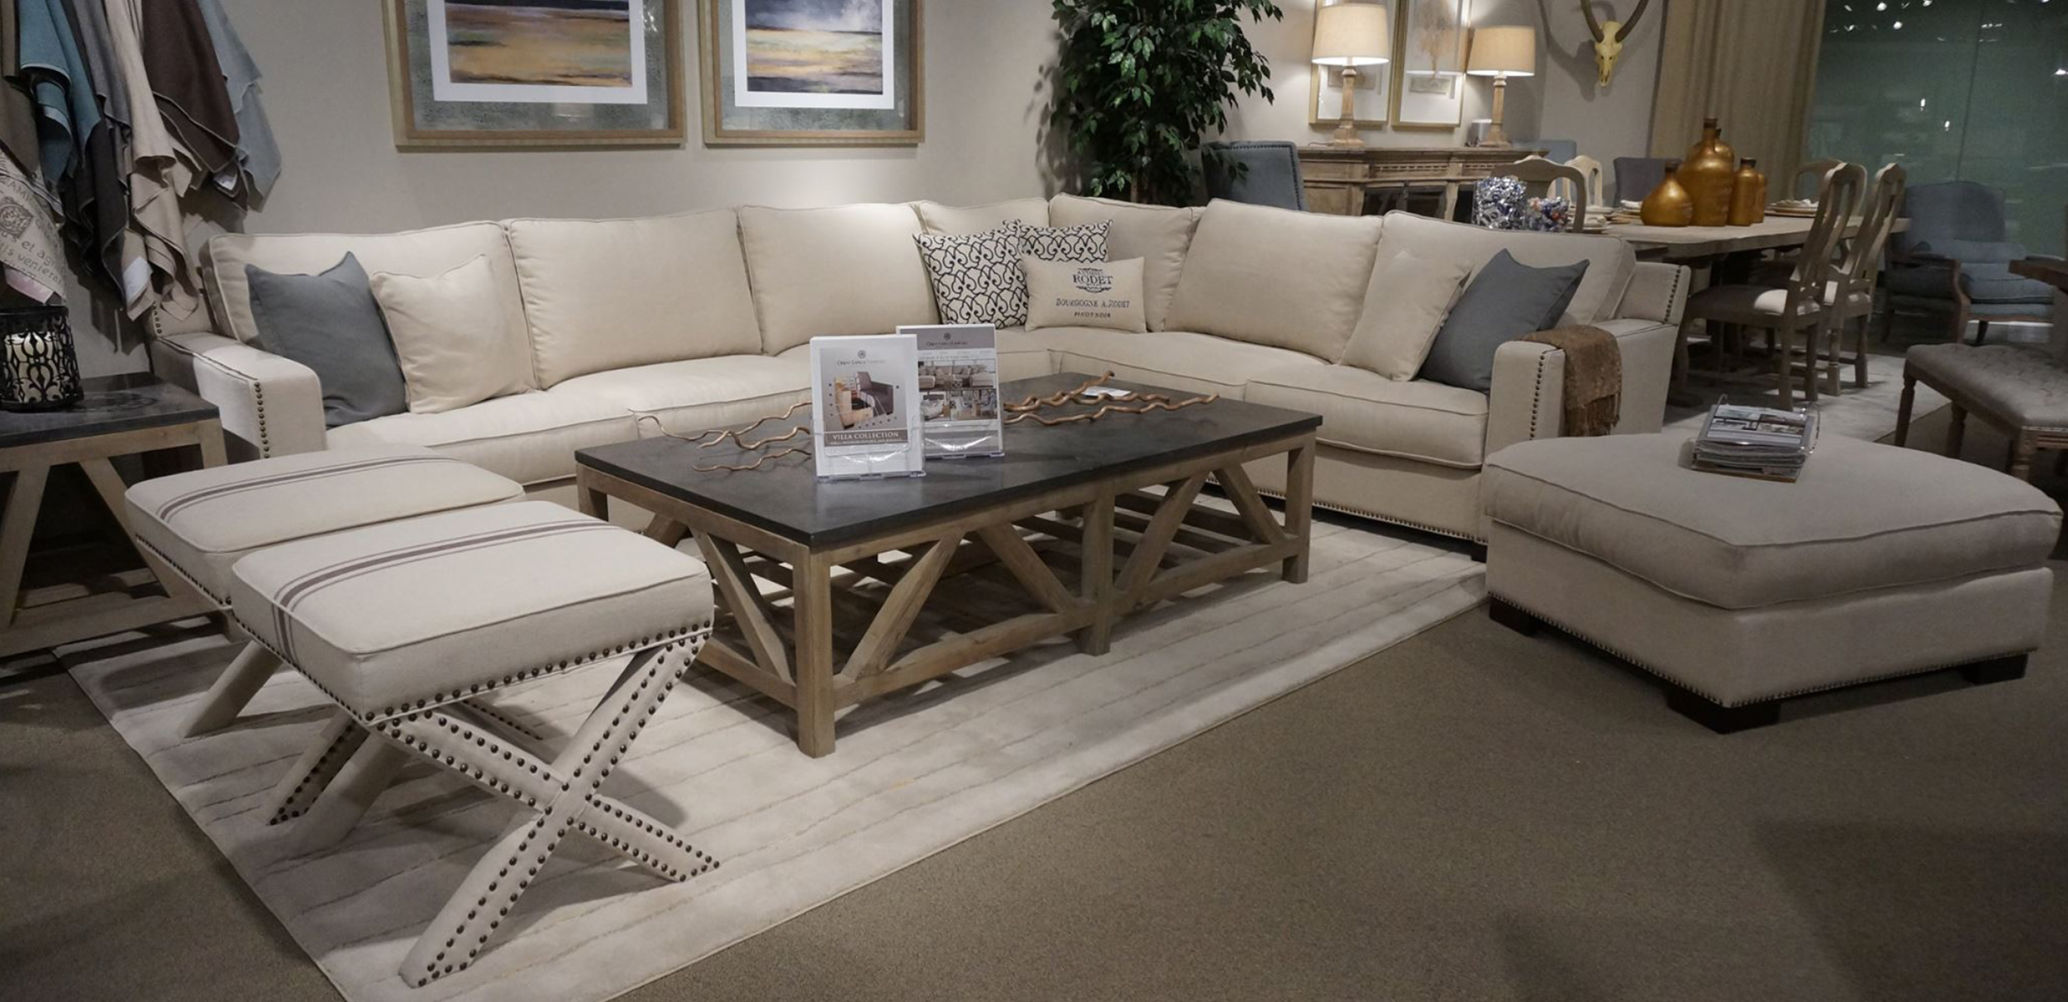 IDeal Furniture IDeal Furniture IDeal Furniture